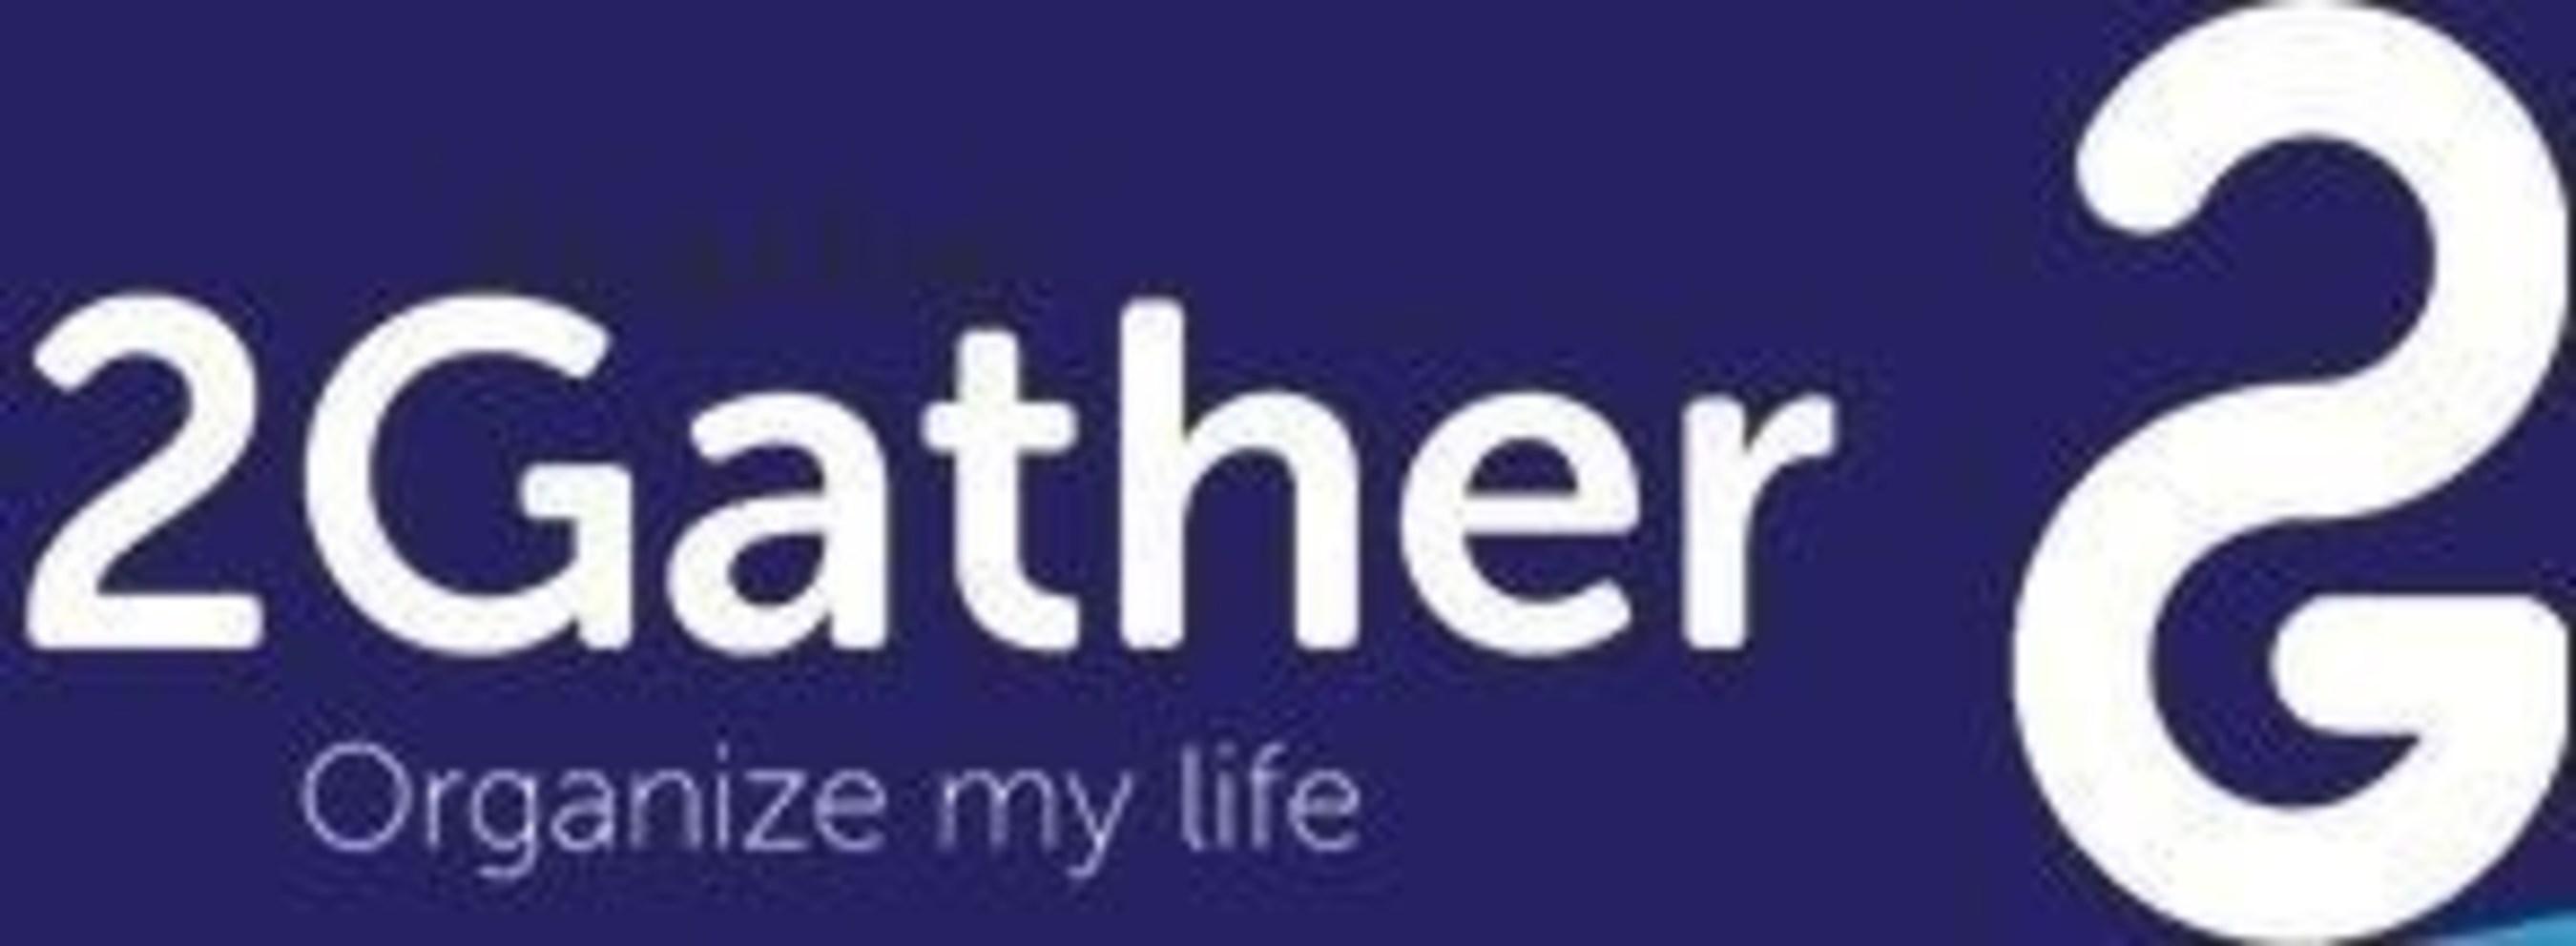 2Gather Announces Mobile App, Beta Launch of Smart Social Media Planning